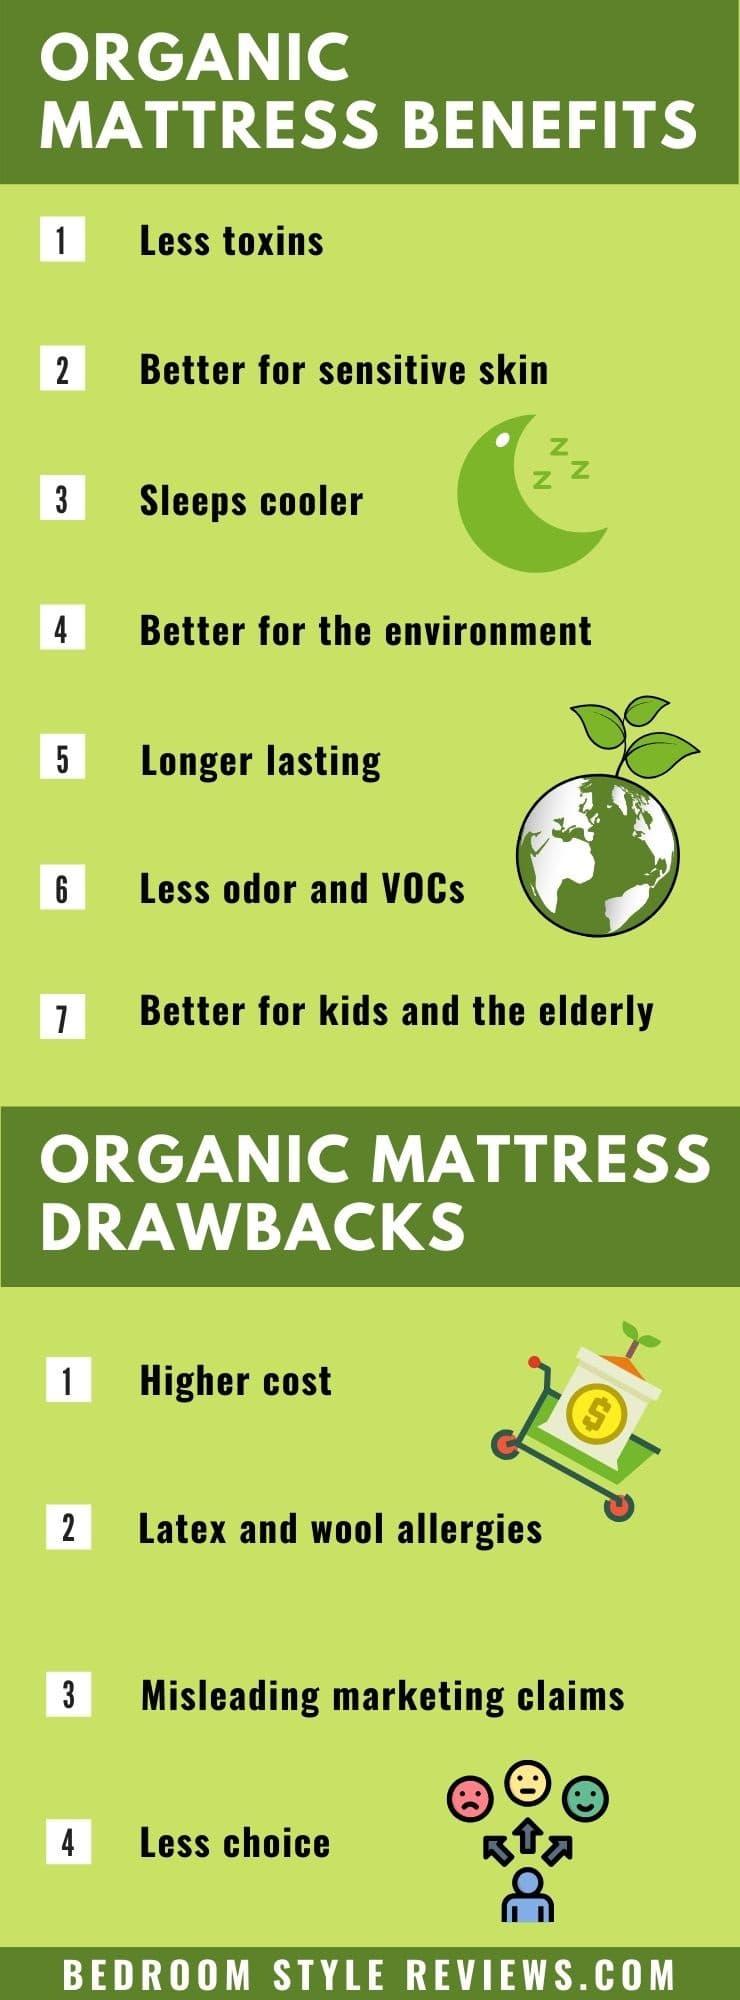 Organic Mattress Benefits v Drawbacks Infographic.